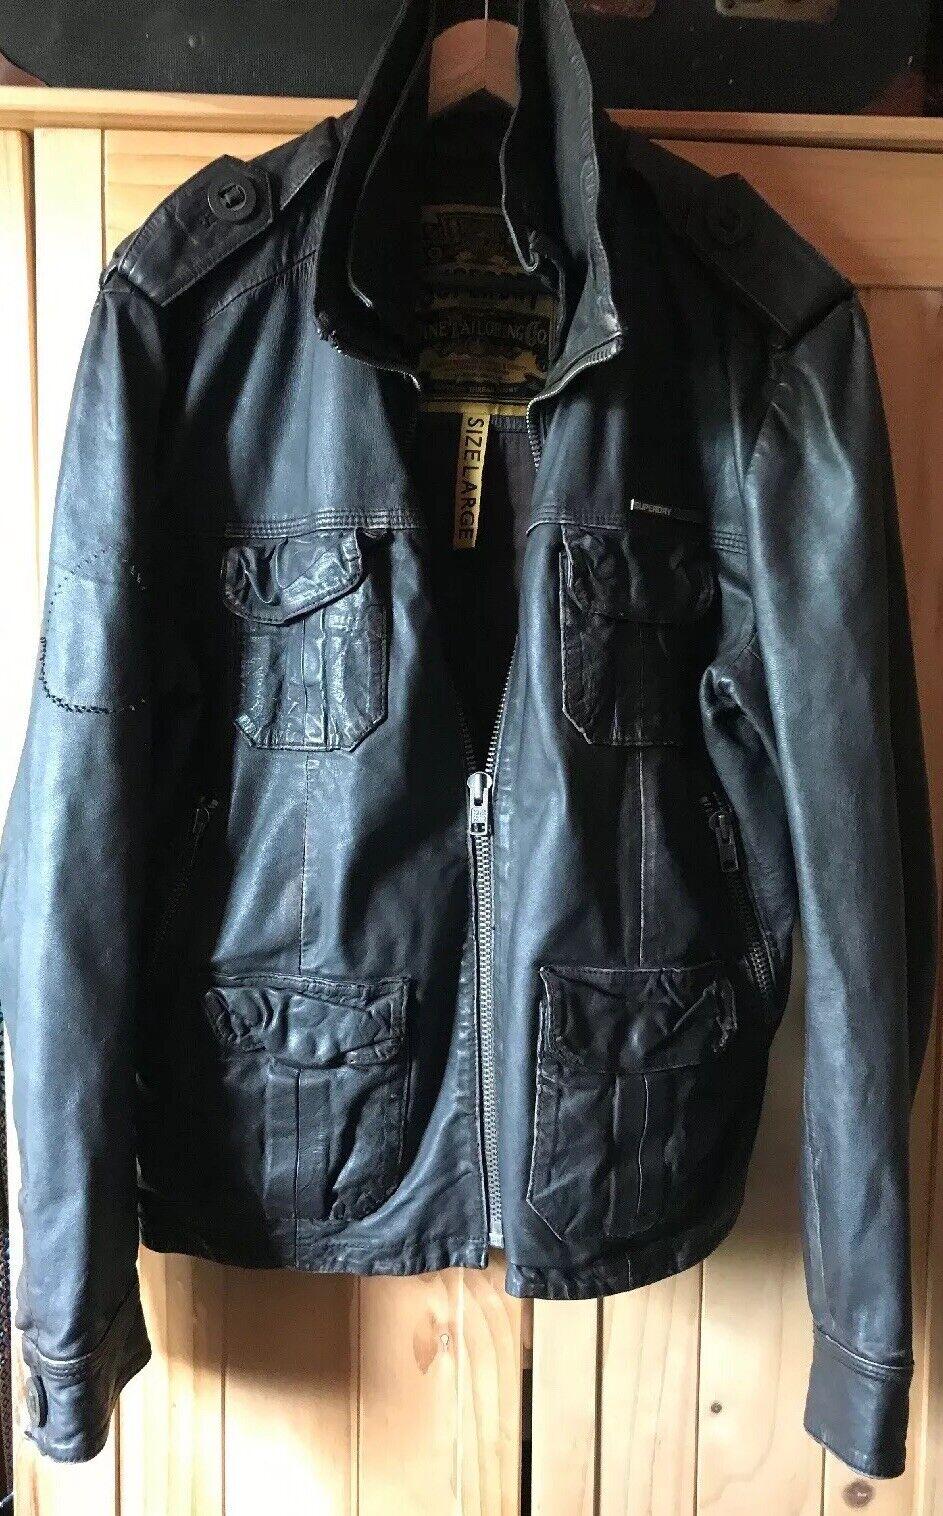 Superdry Brad braun leather jacket, vintage vintage vintage